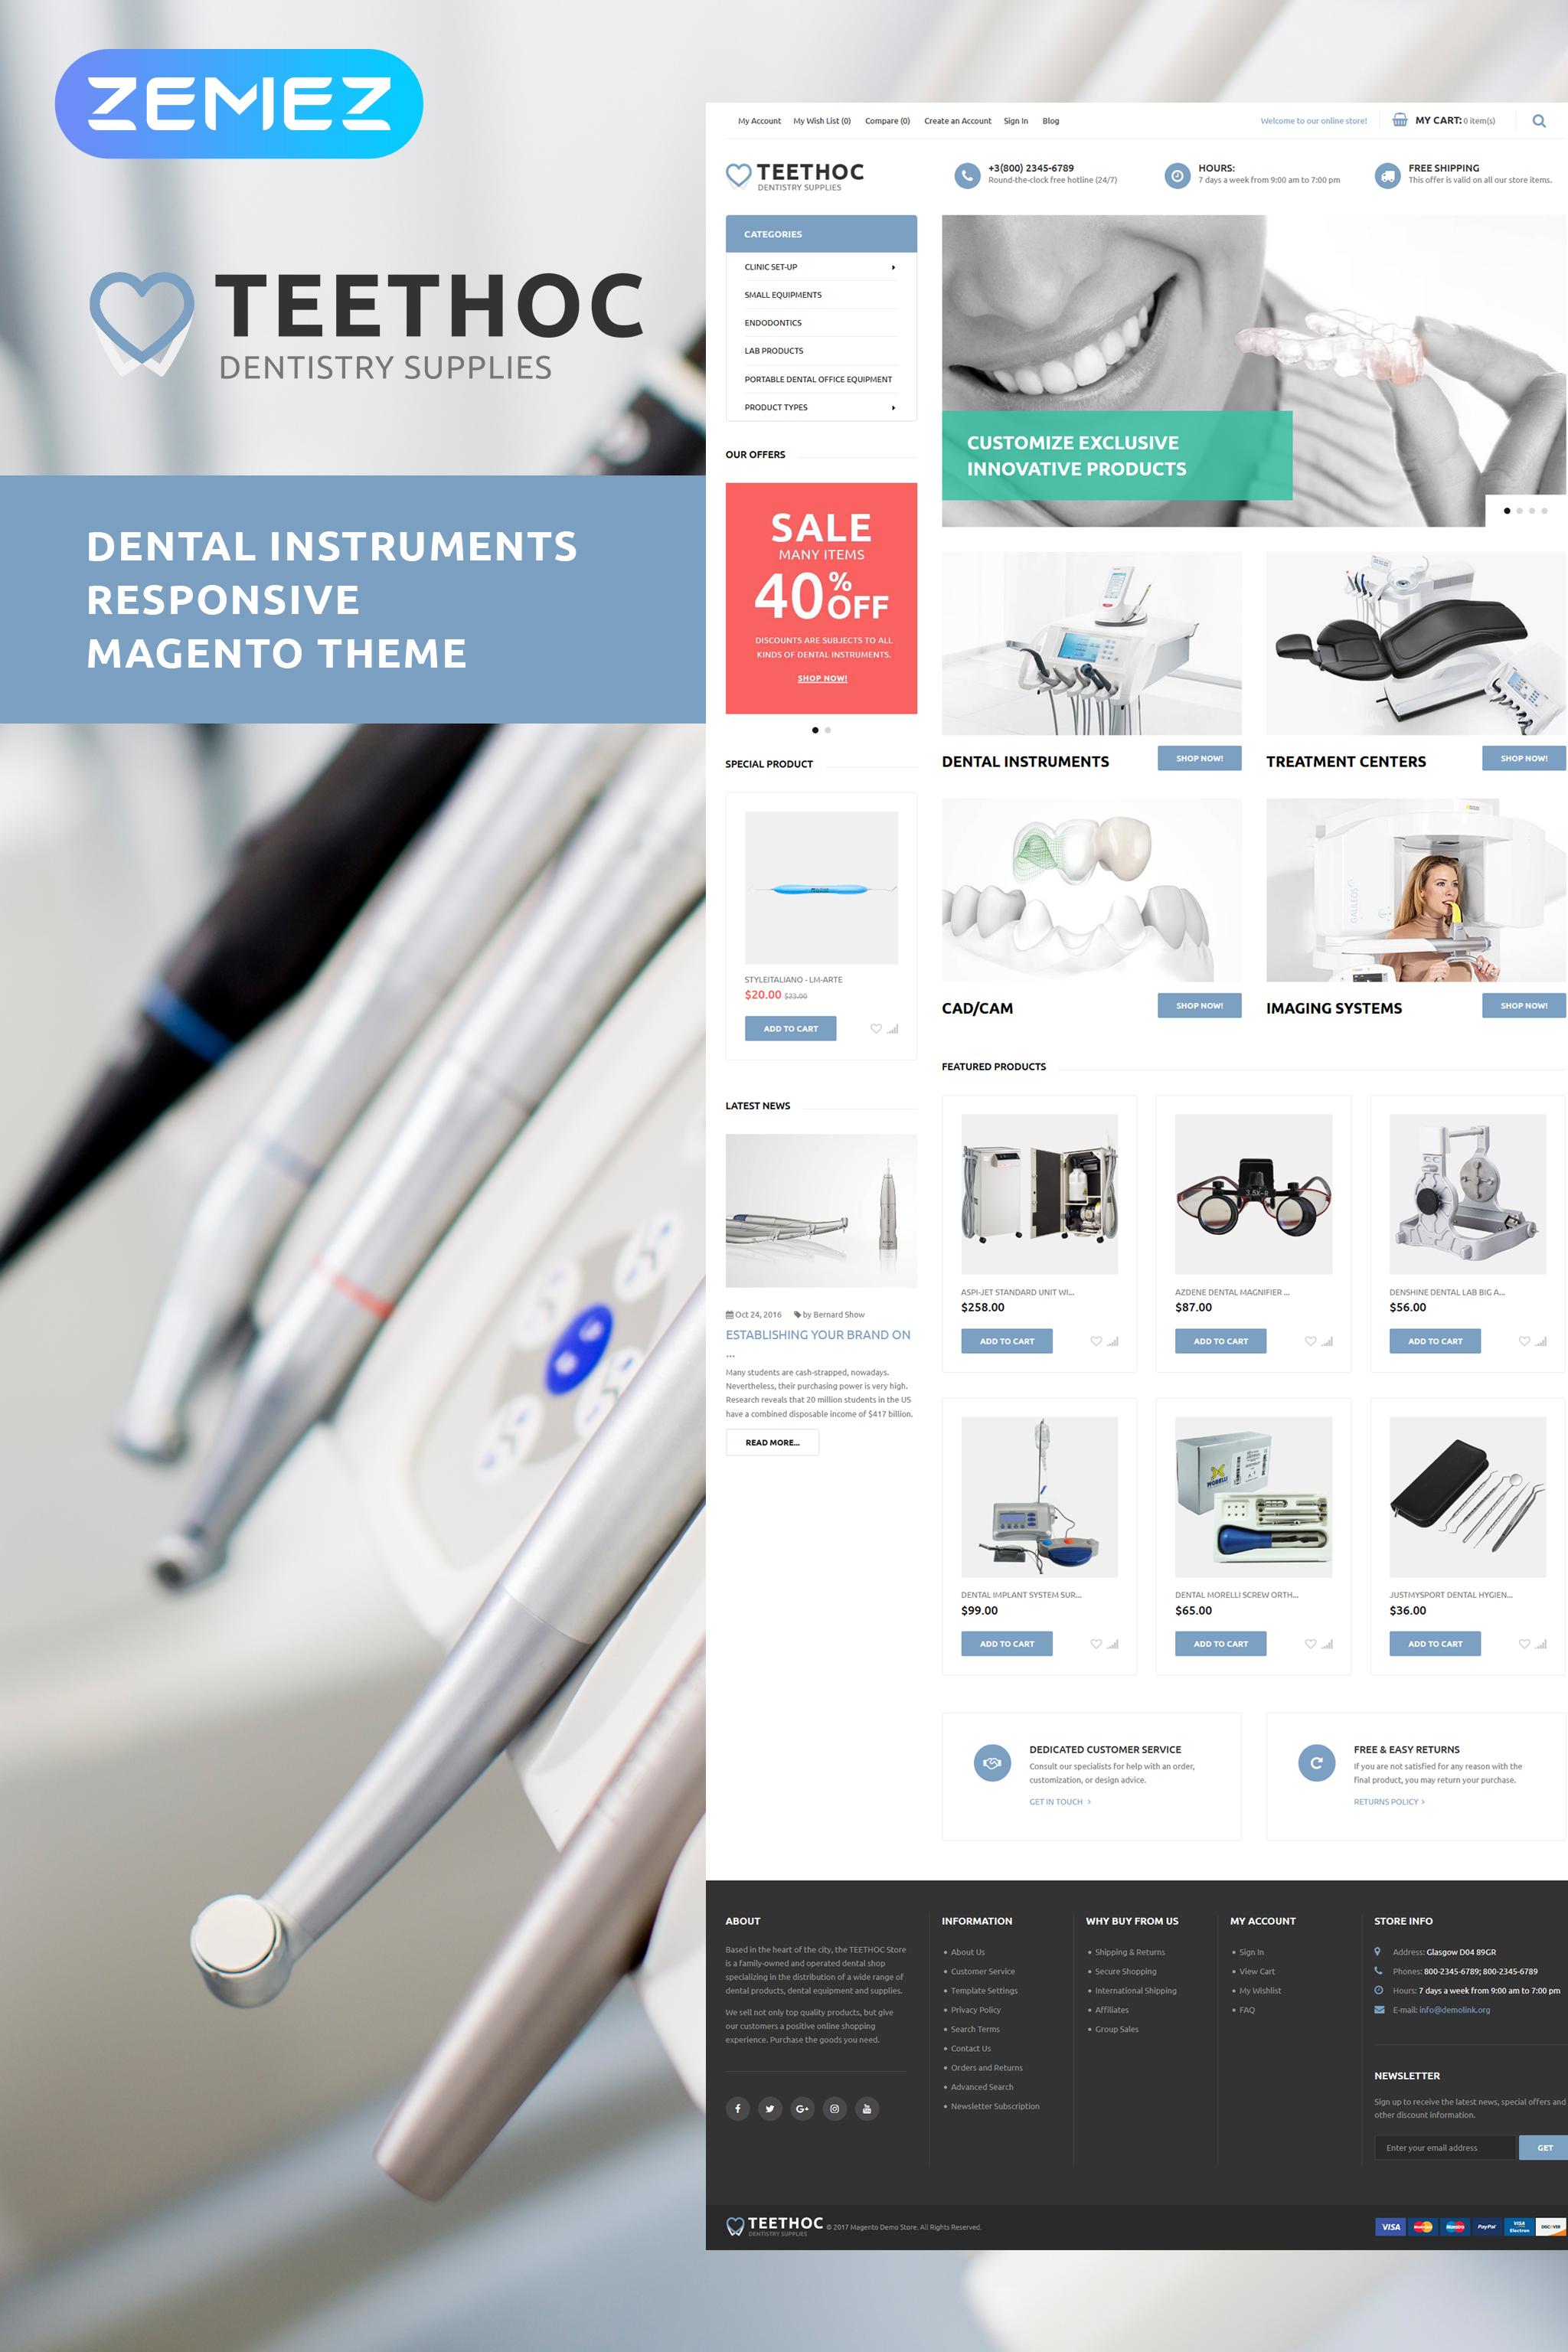 Teethoc - Dental Instruments №62105